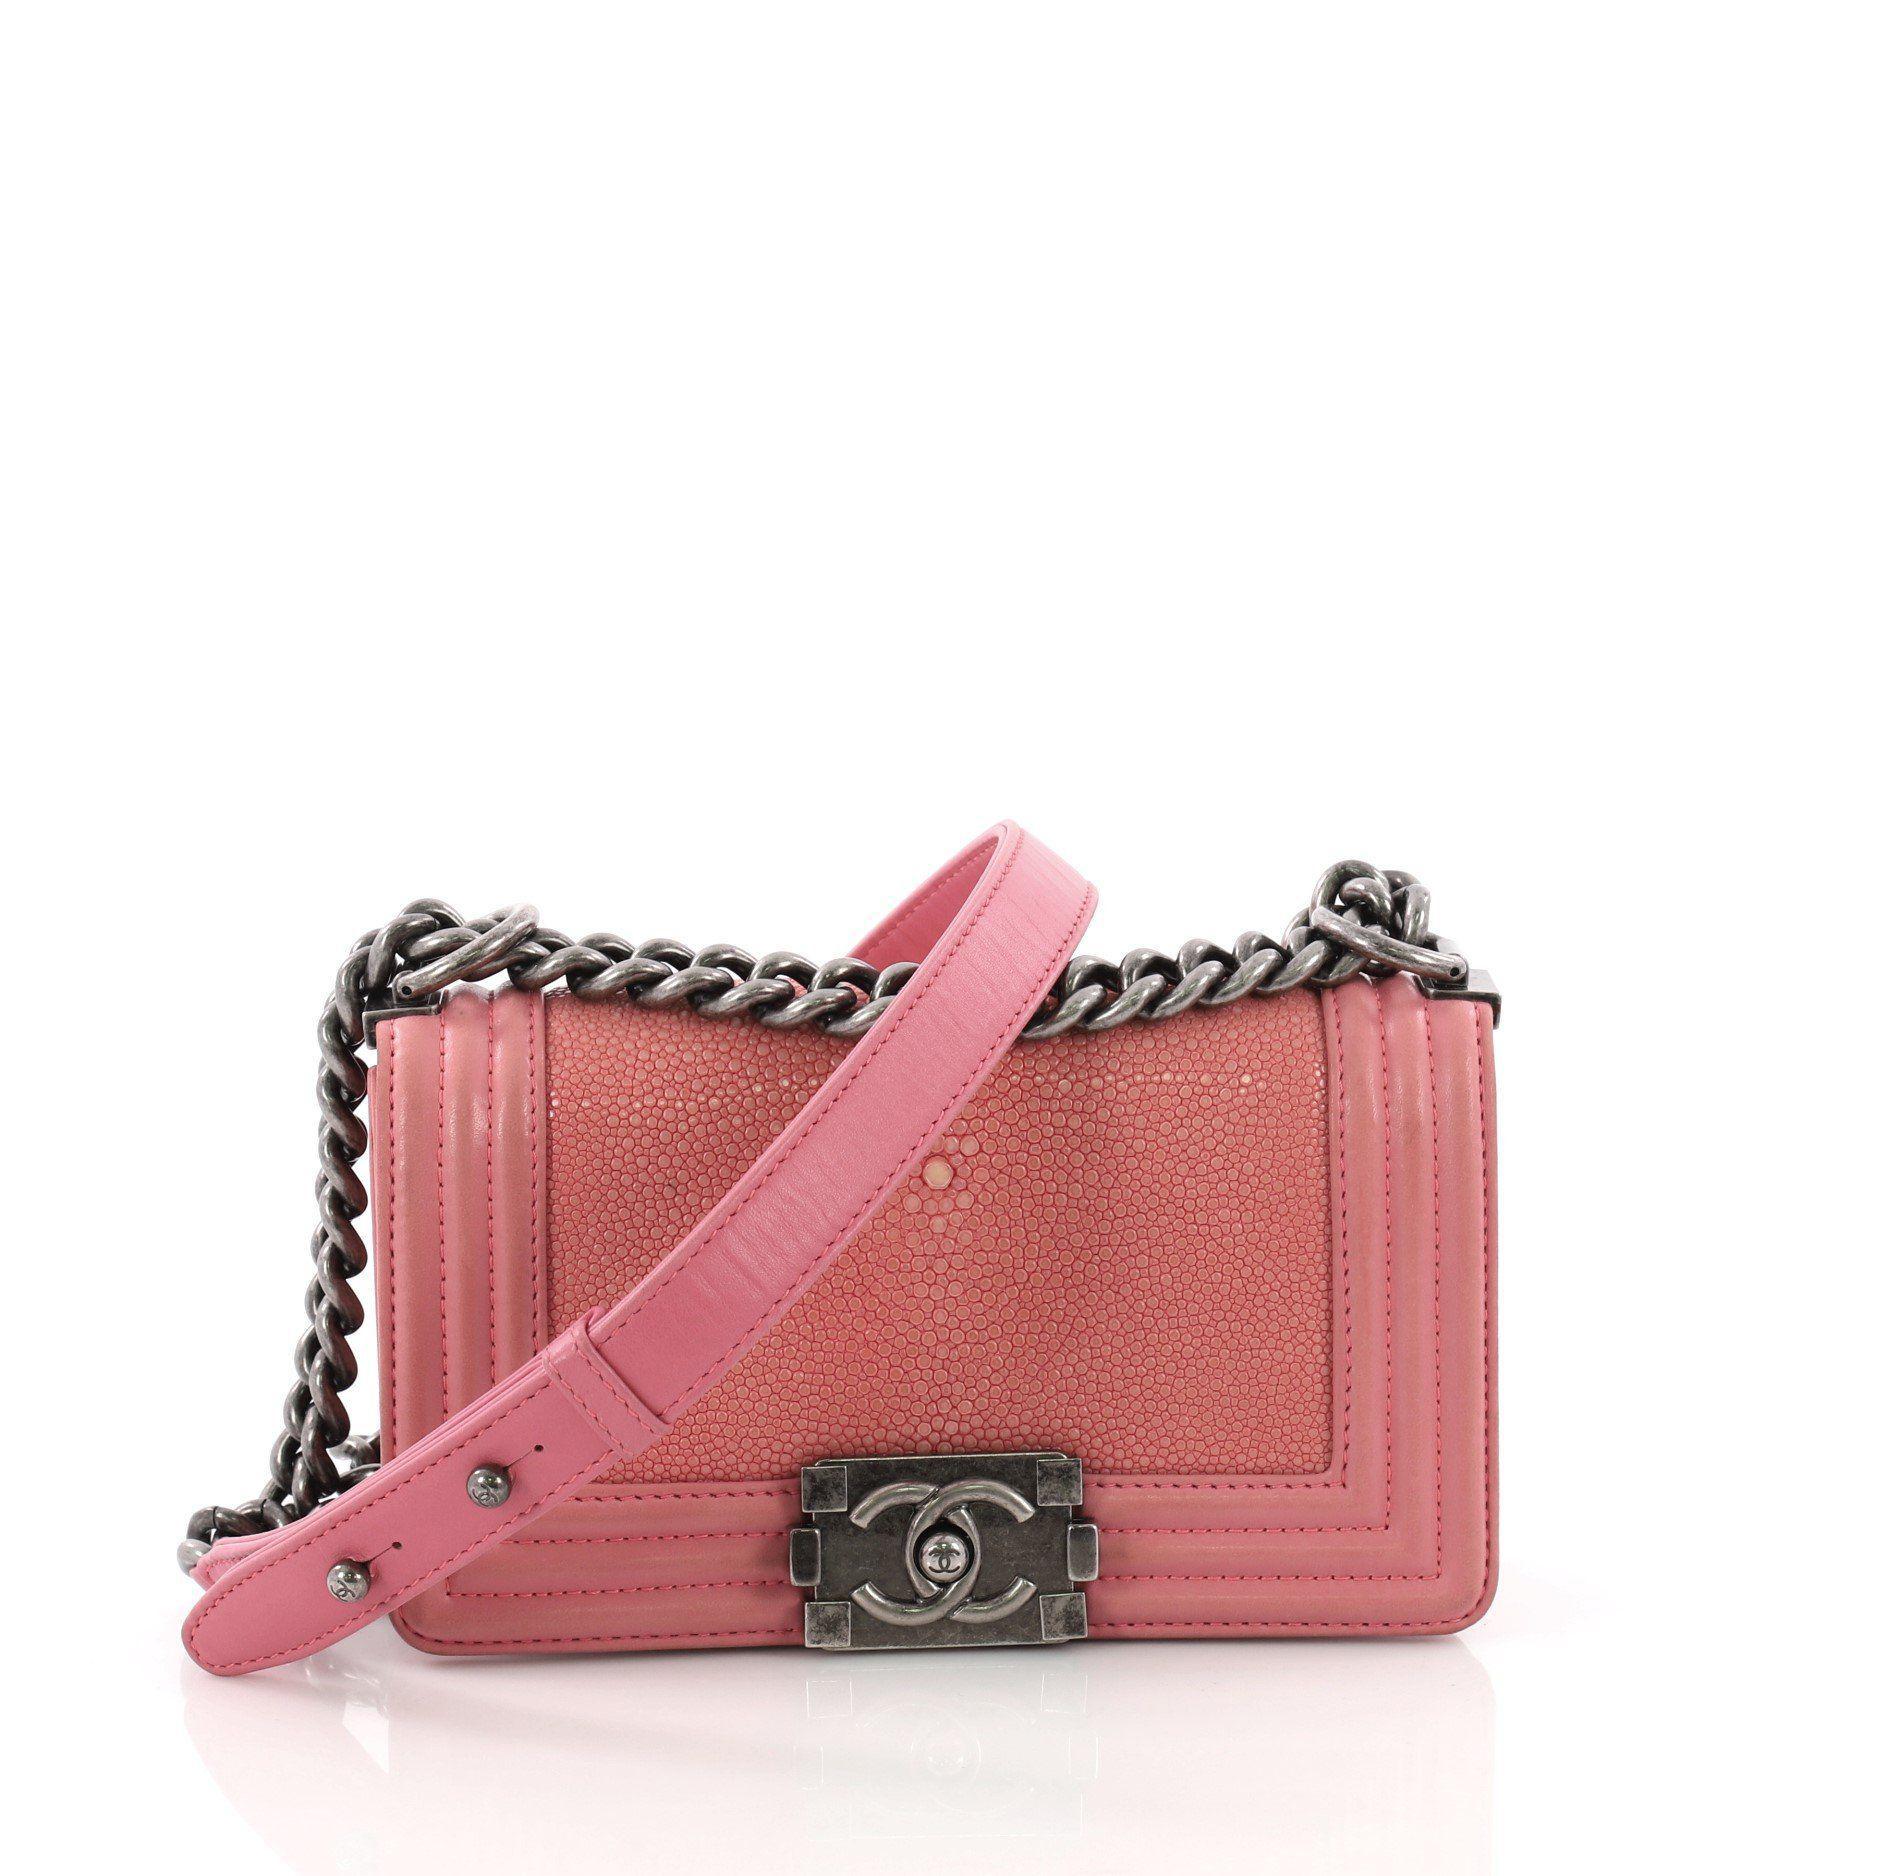 3d9c0c9fce3d68 Chanel. Women's Pre Owned Boy Flap Bag Stingray Small